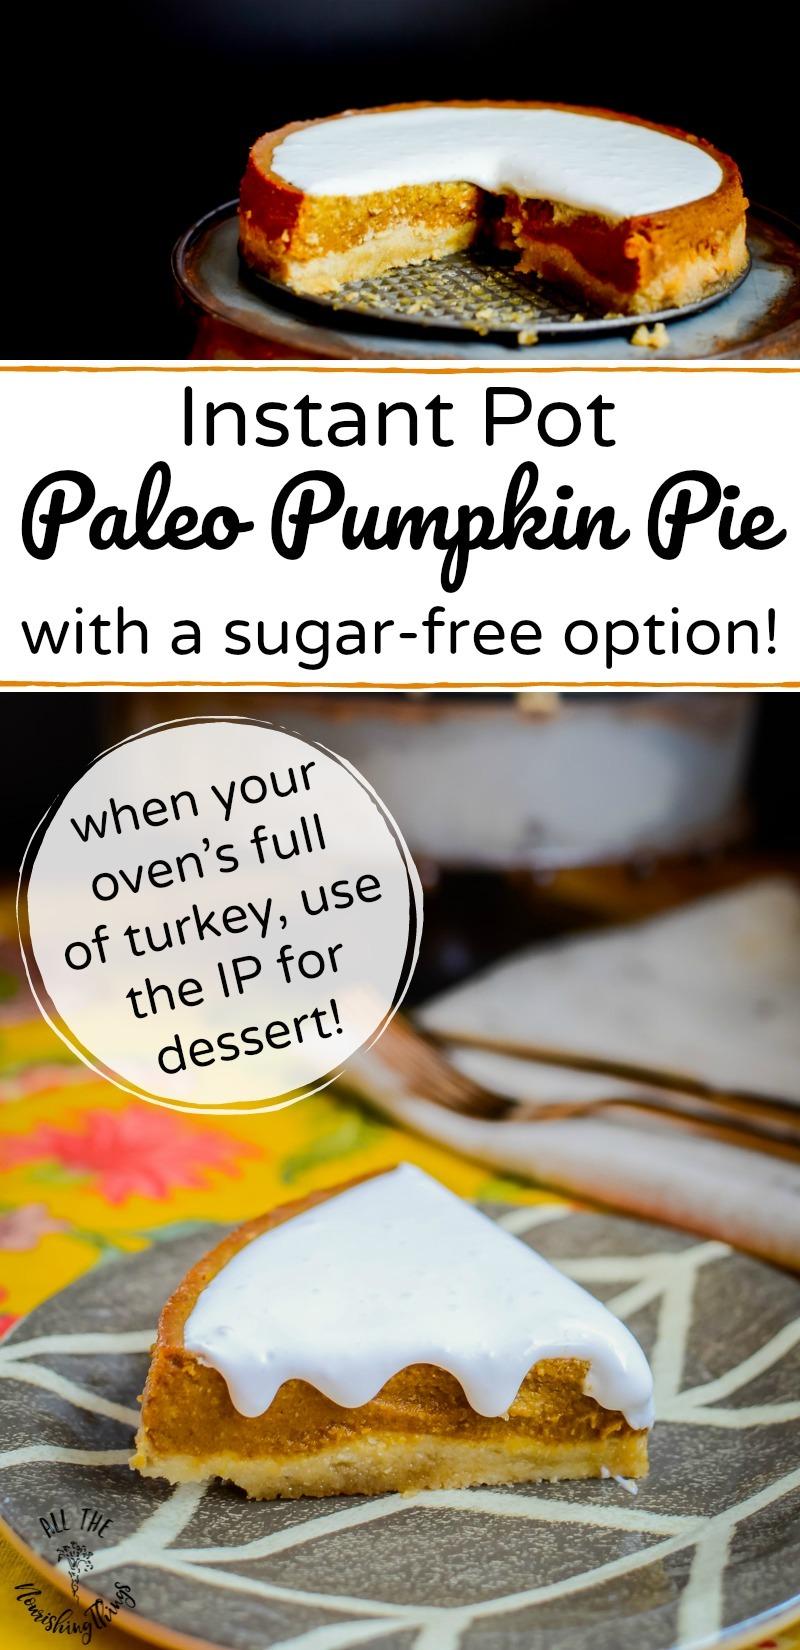 instant pot paleo pumpkin pie with text overlay